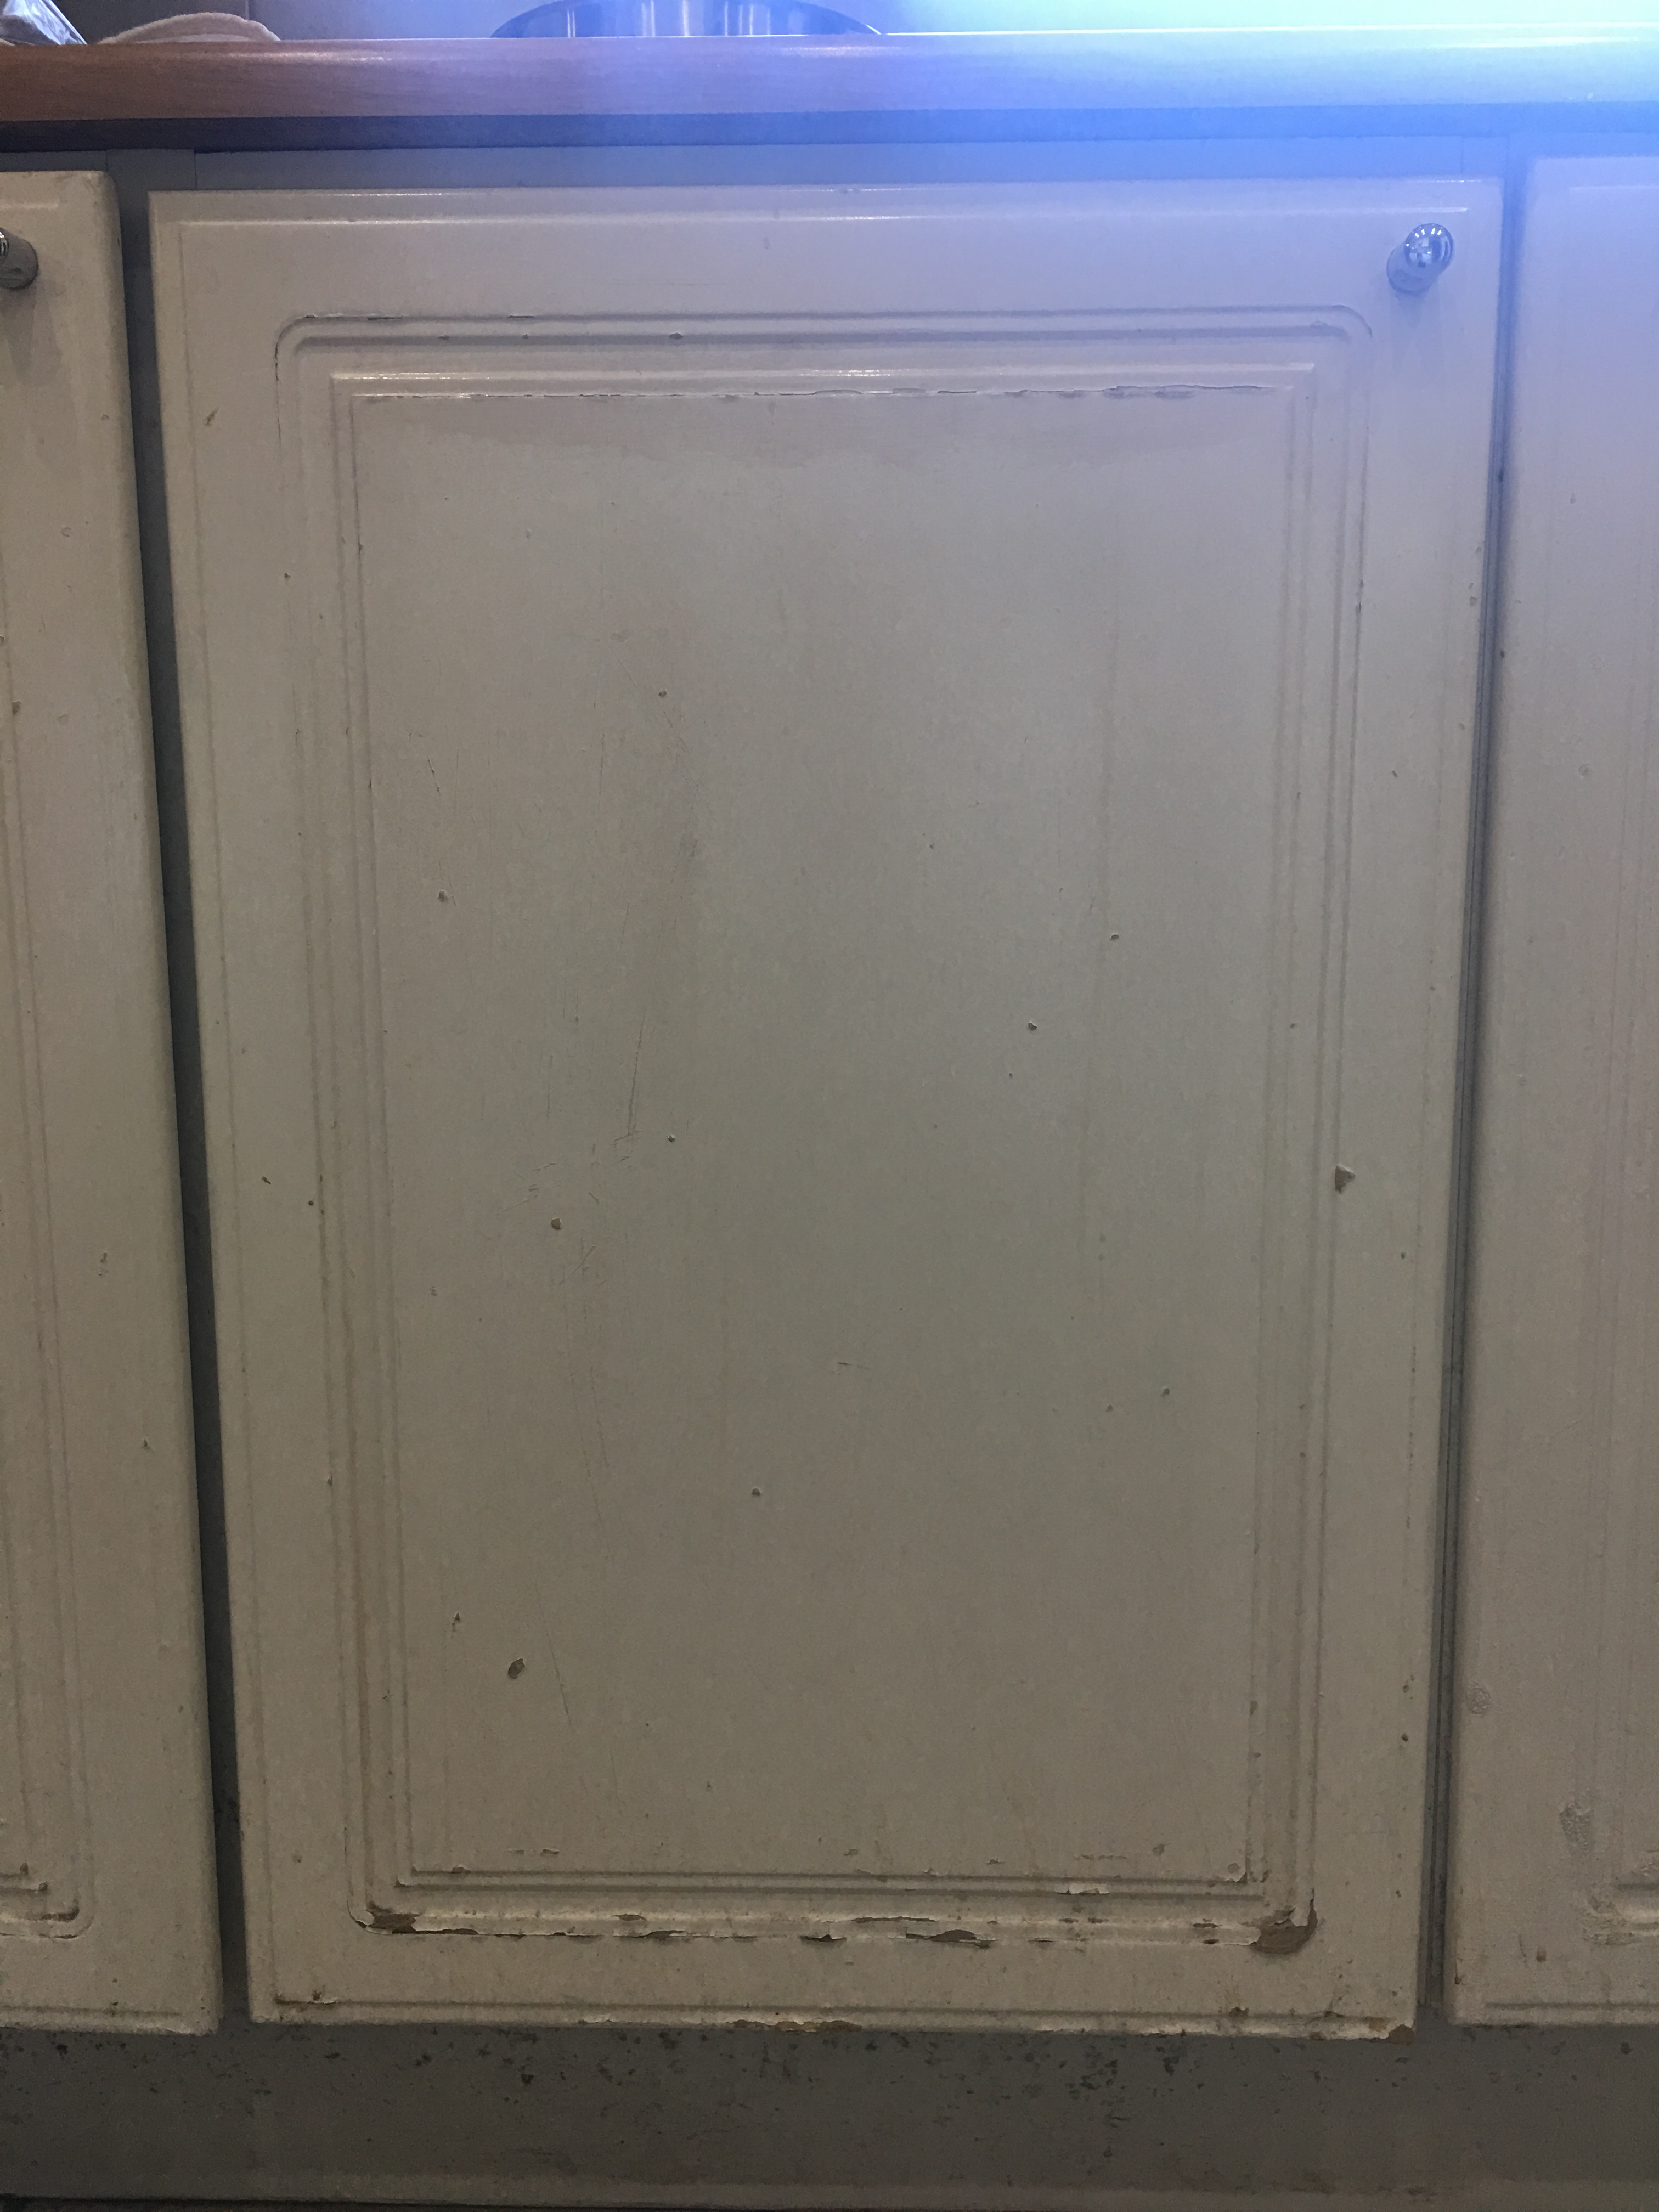 White Enamel Paint - WiteKote - Refurbishing Paint